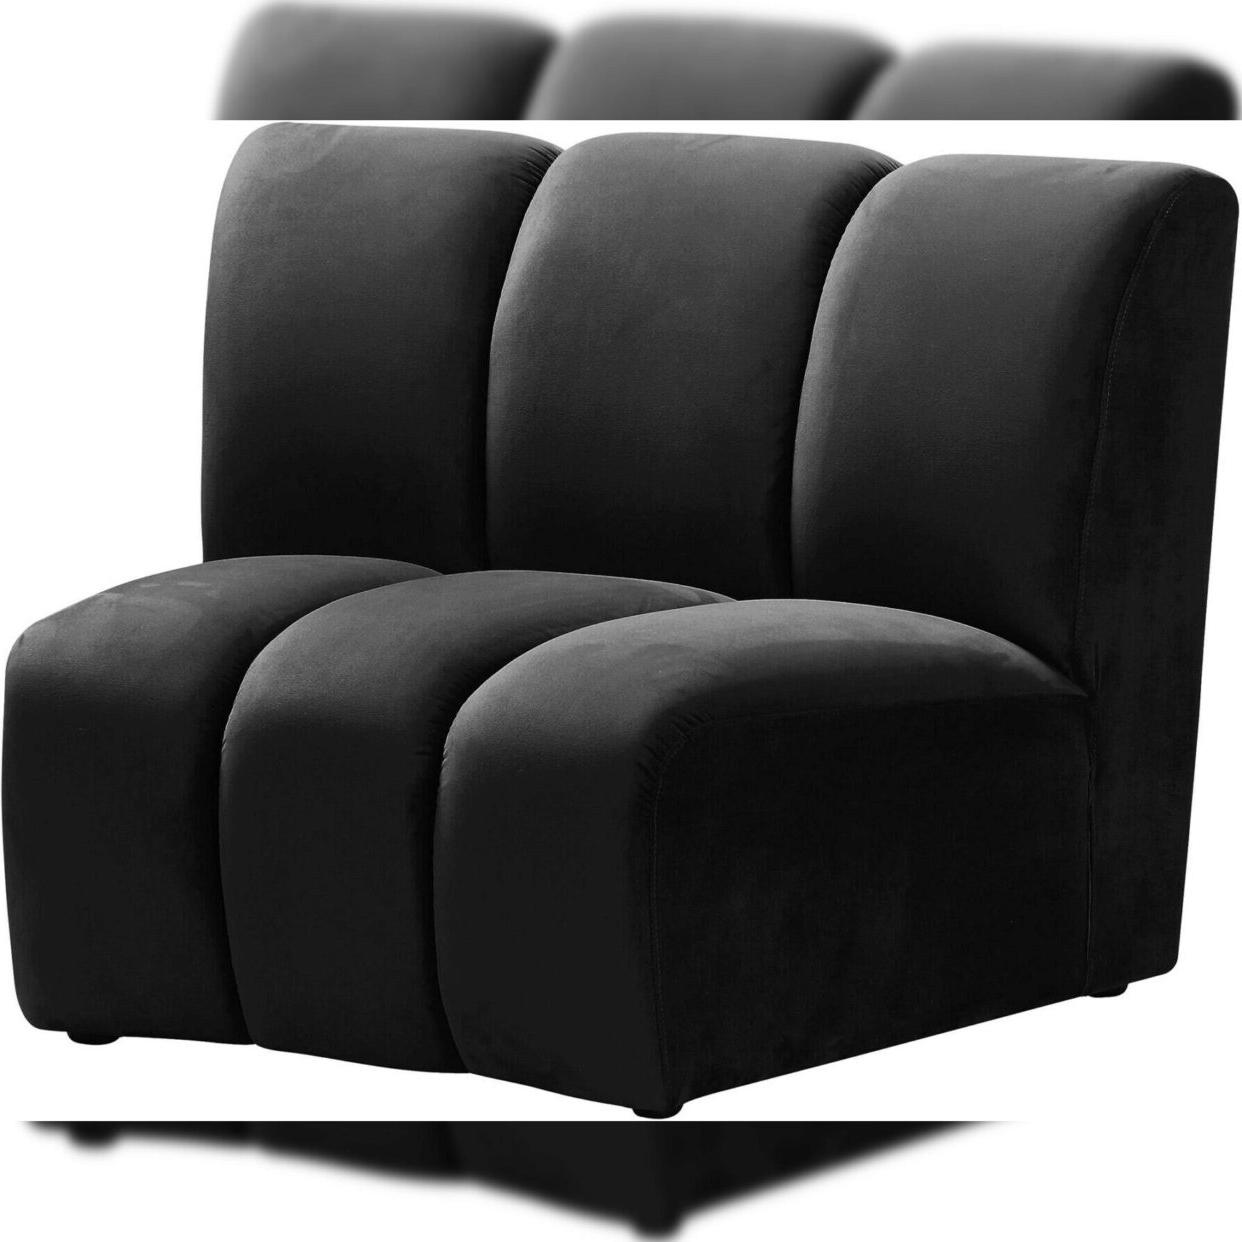 Black Velvet 638Black 3Pc Modular Sectional Sofa Infinity Regarding Most Recently Released 3Pc French Seamed Sectional Sofas Velvet Black (View 19 of 25)